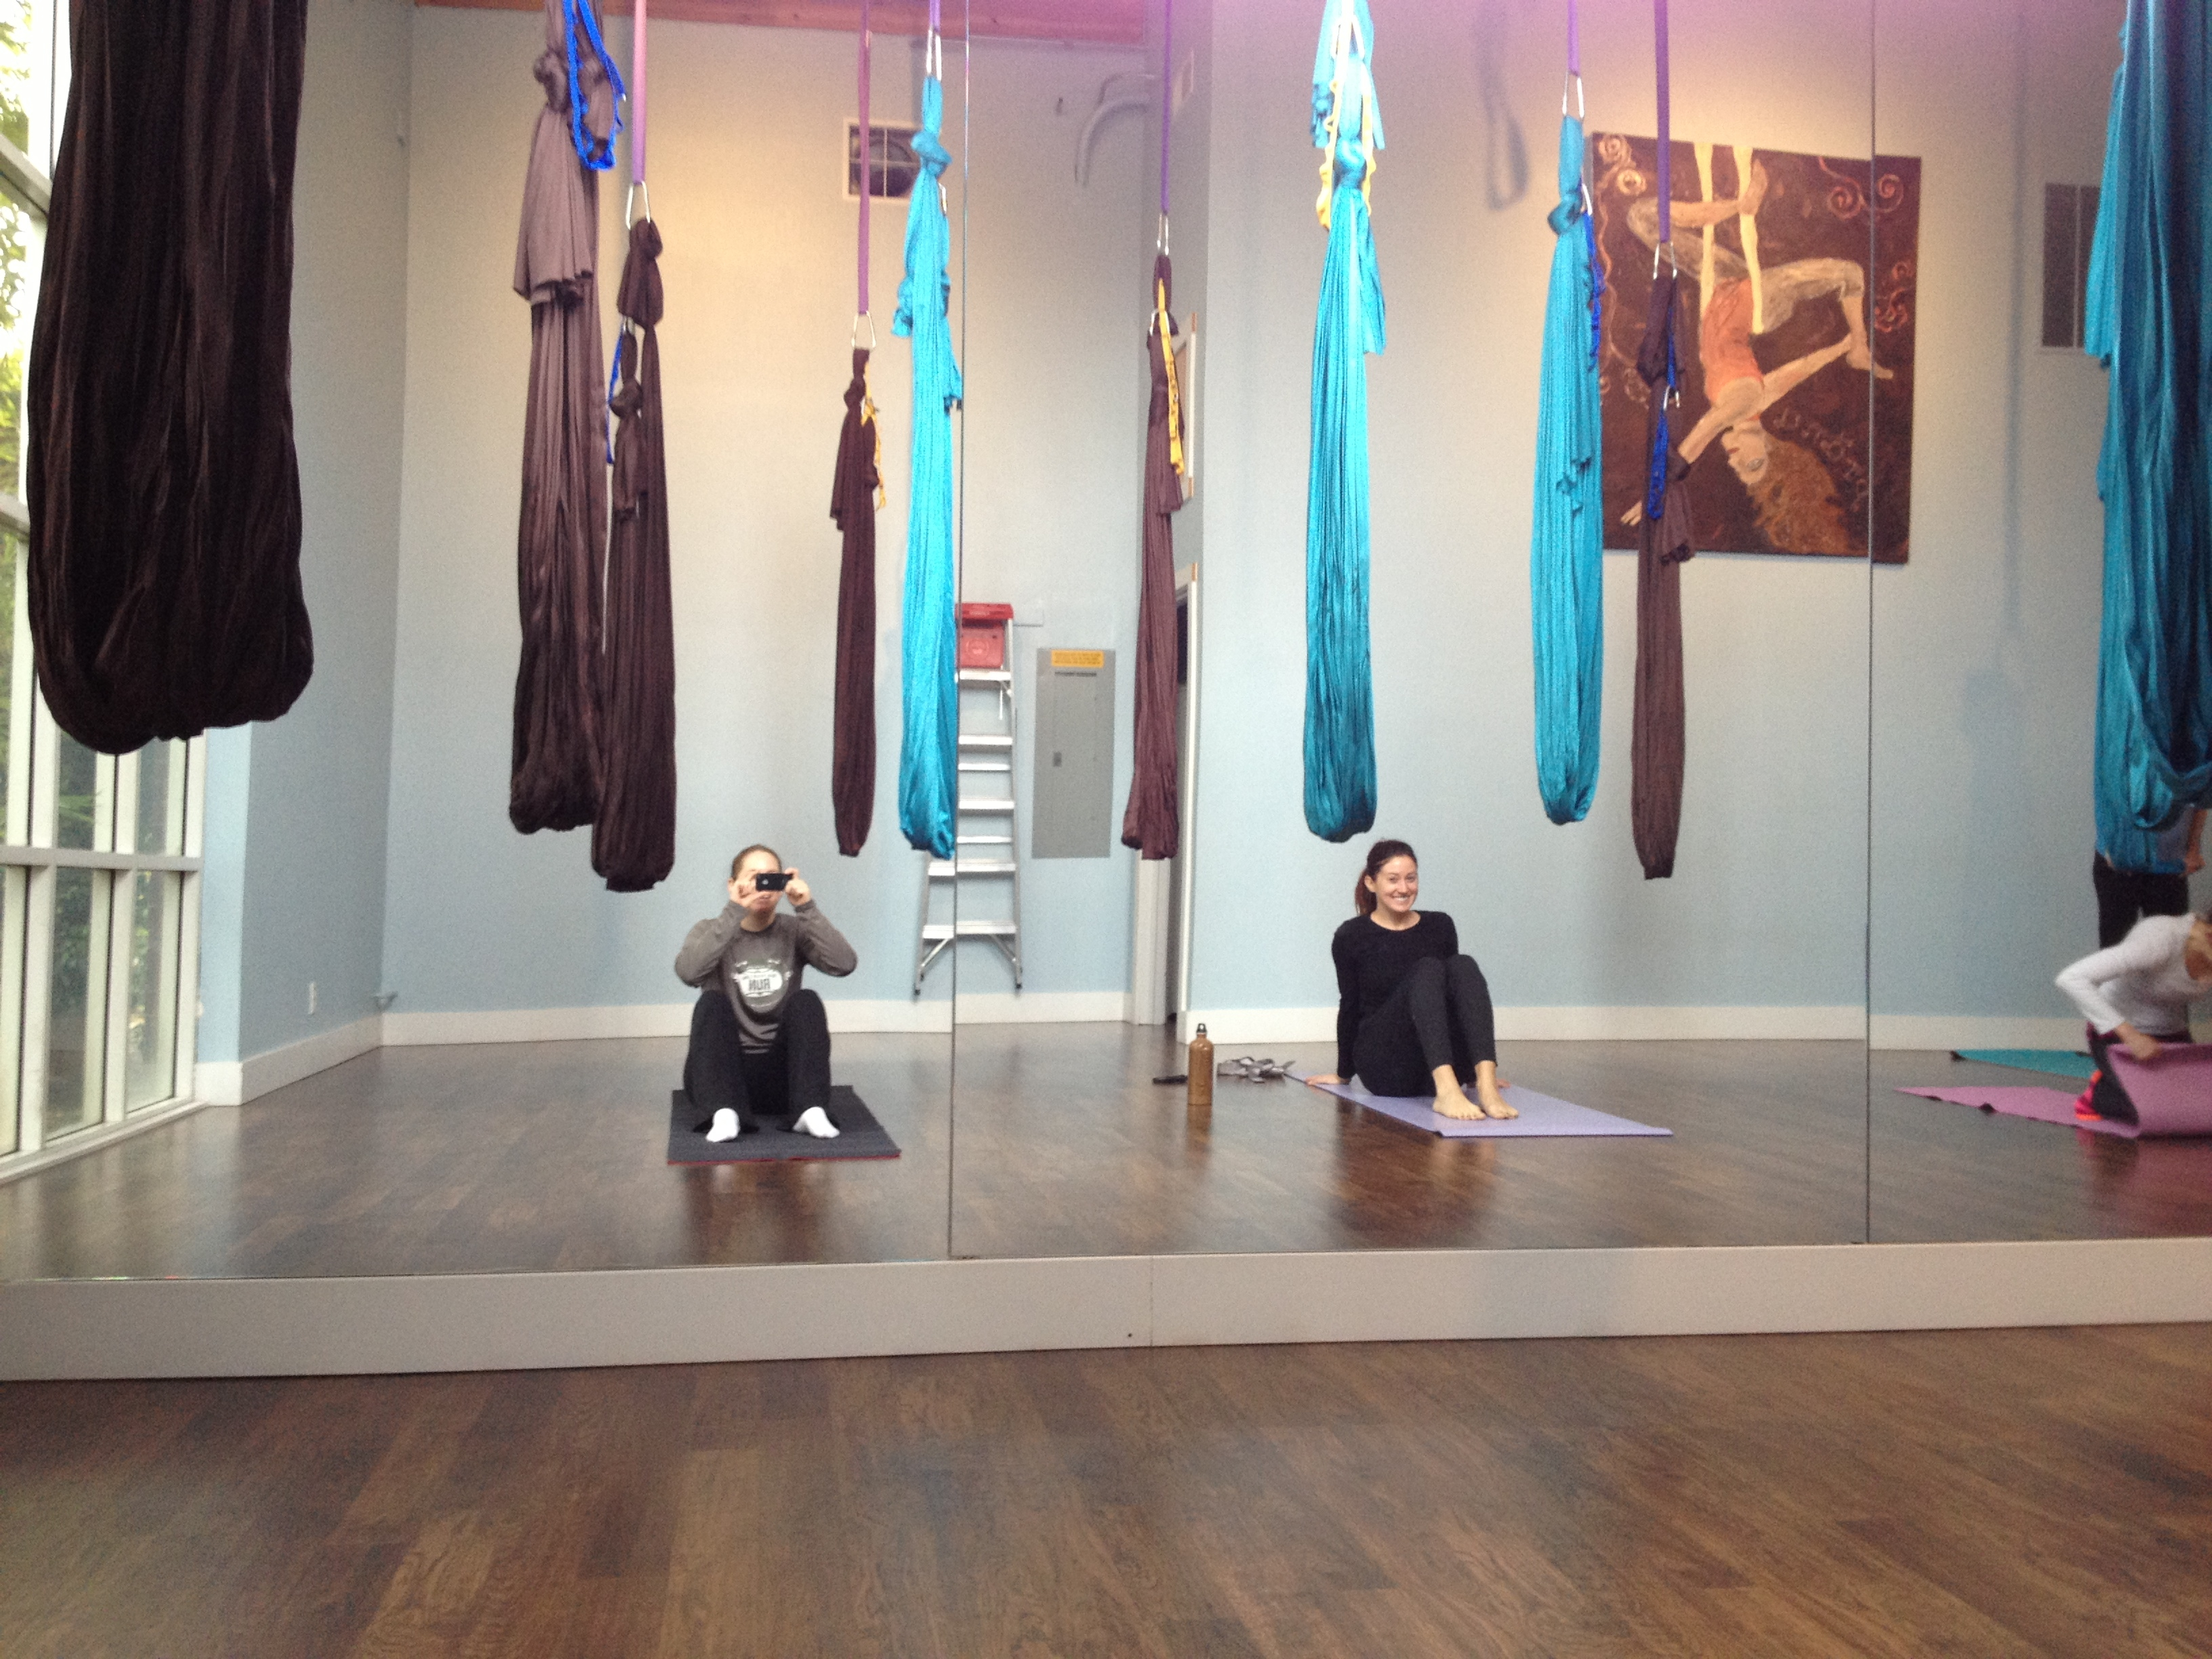 Yoga studio 3